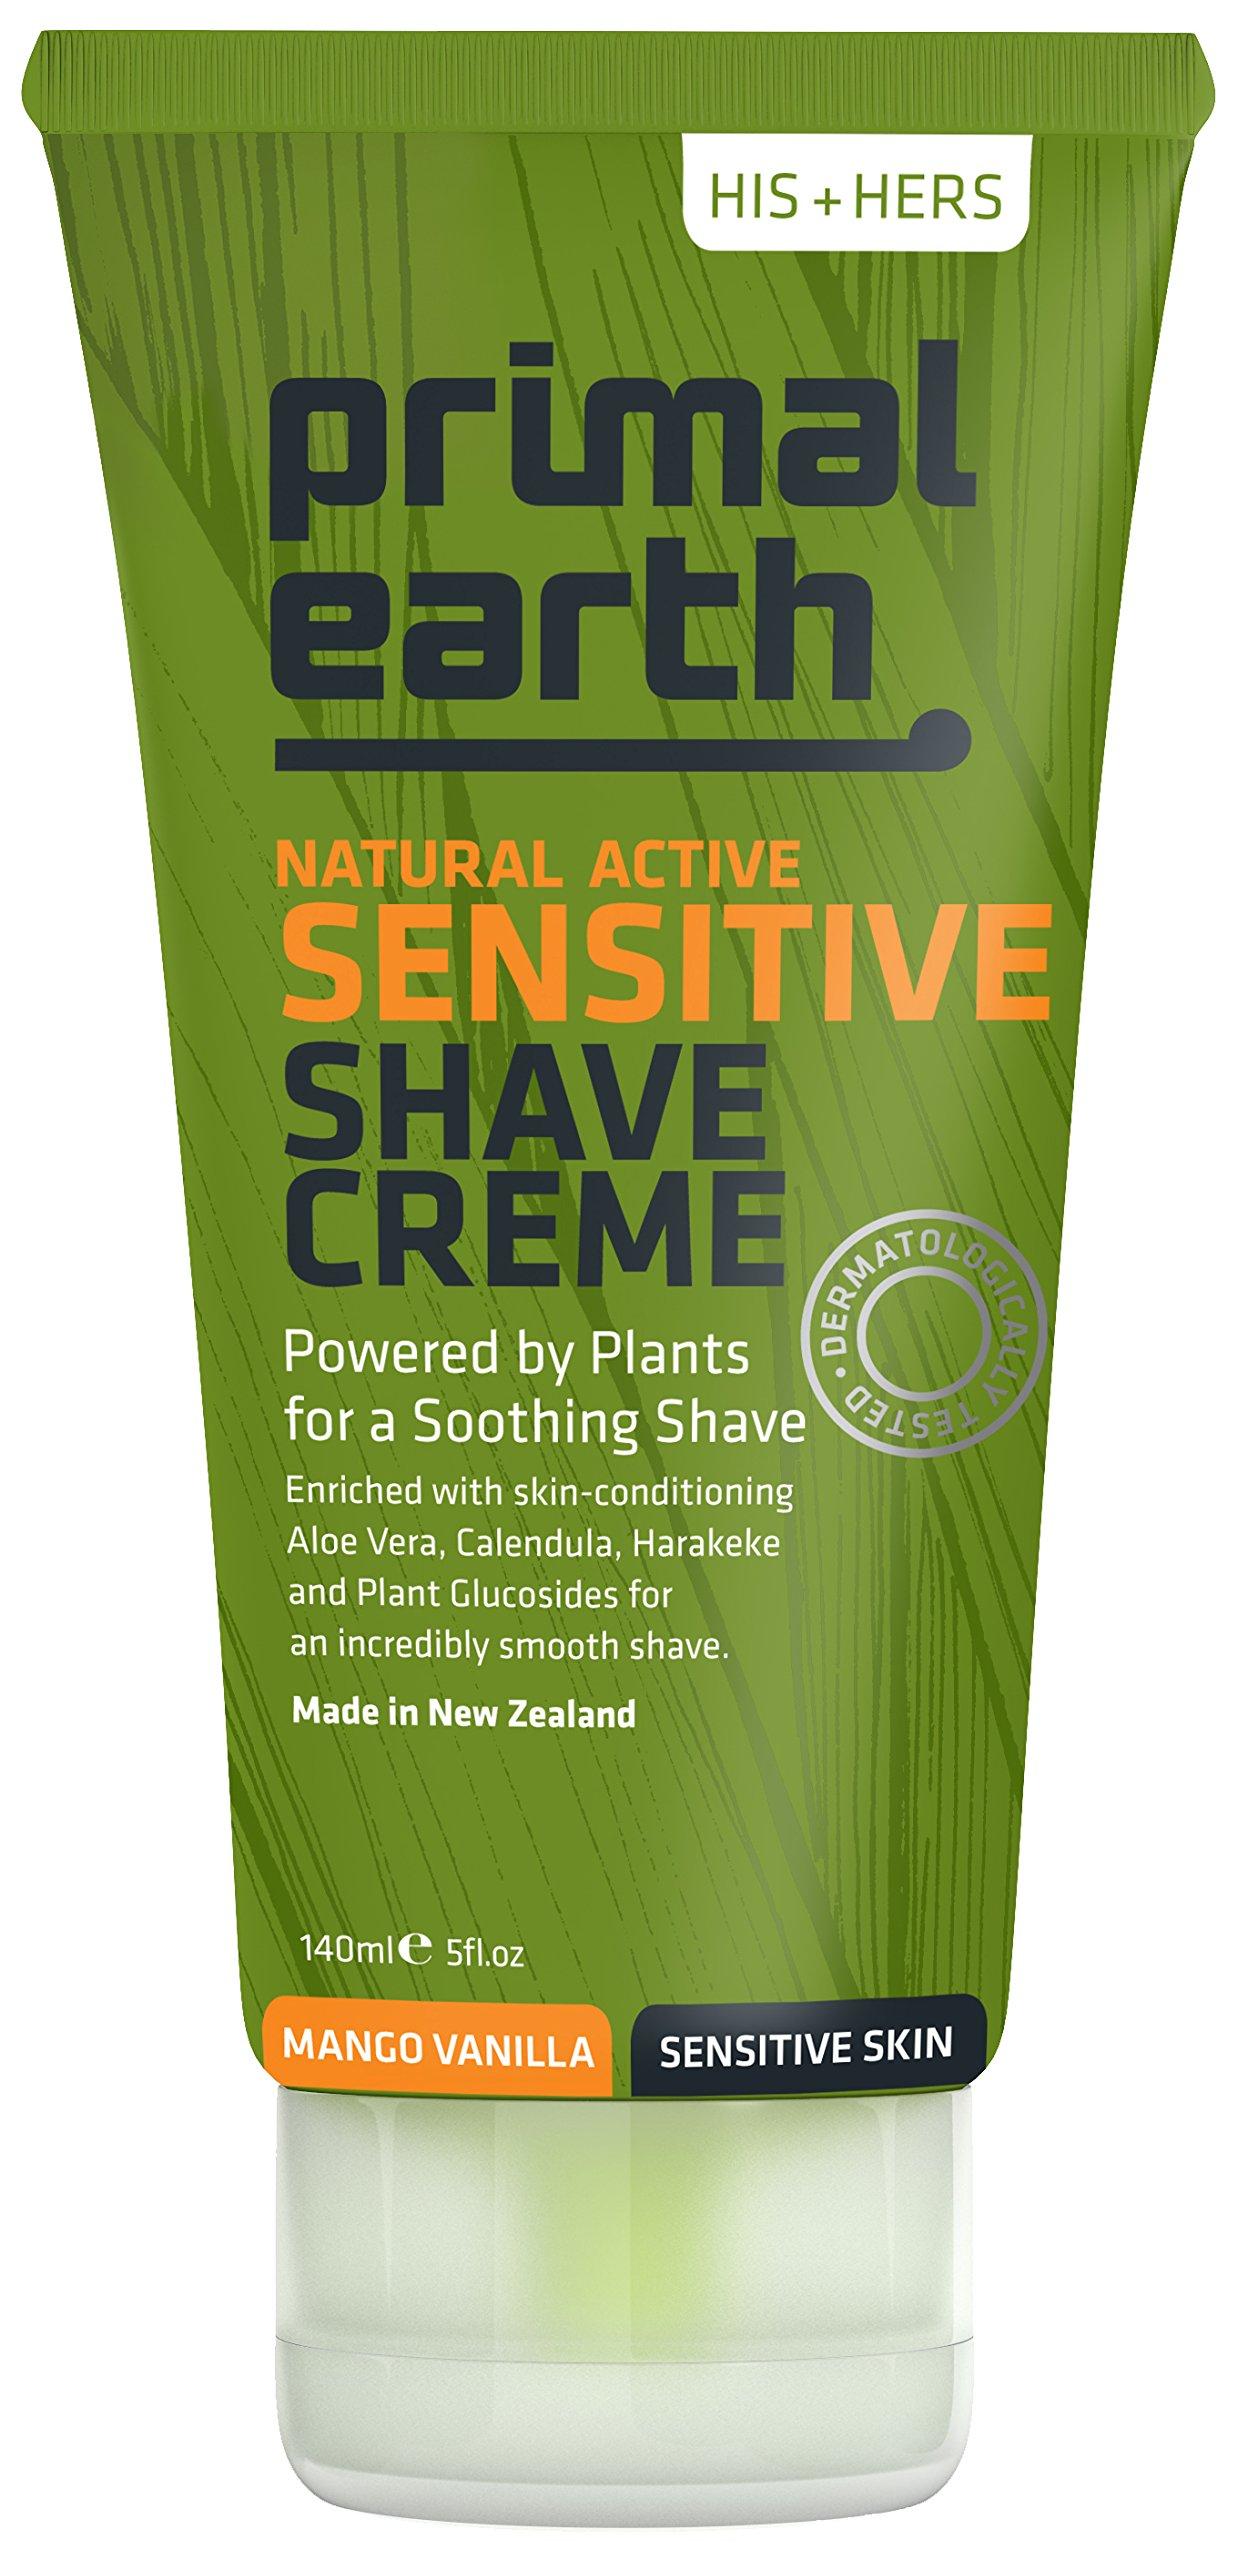 Primal Earth Sensitive Shave Creme 140ml (5 oz) by Primal Earth (Image #1)